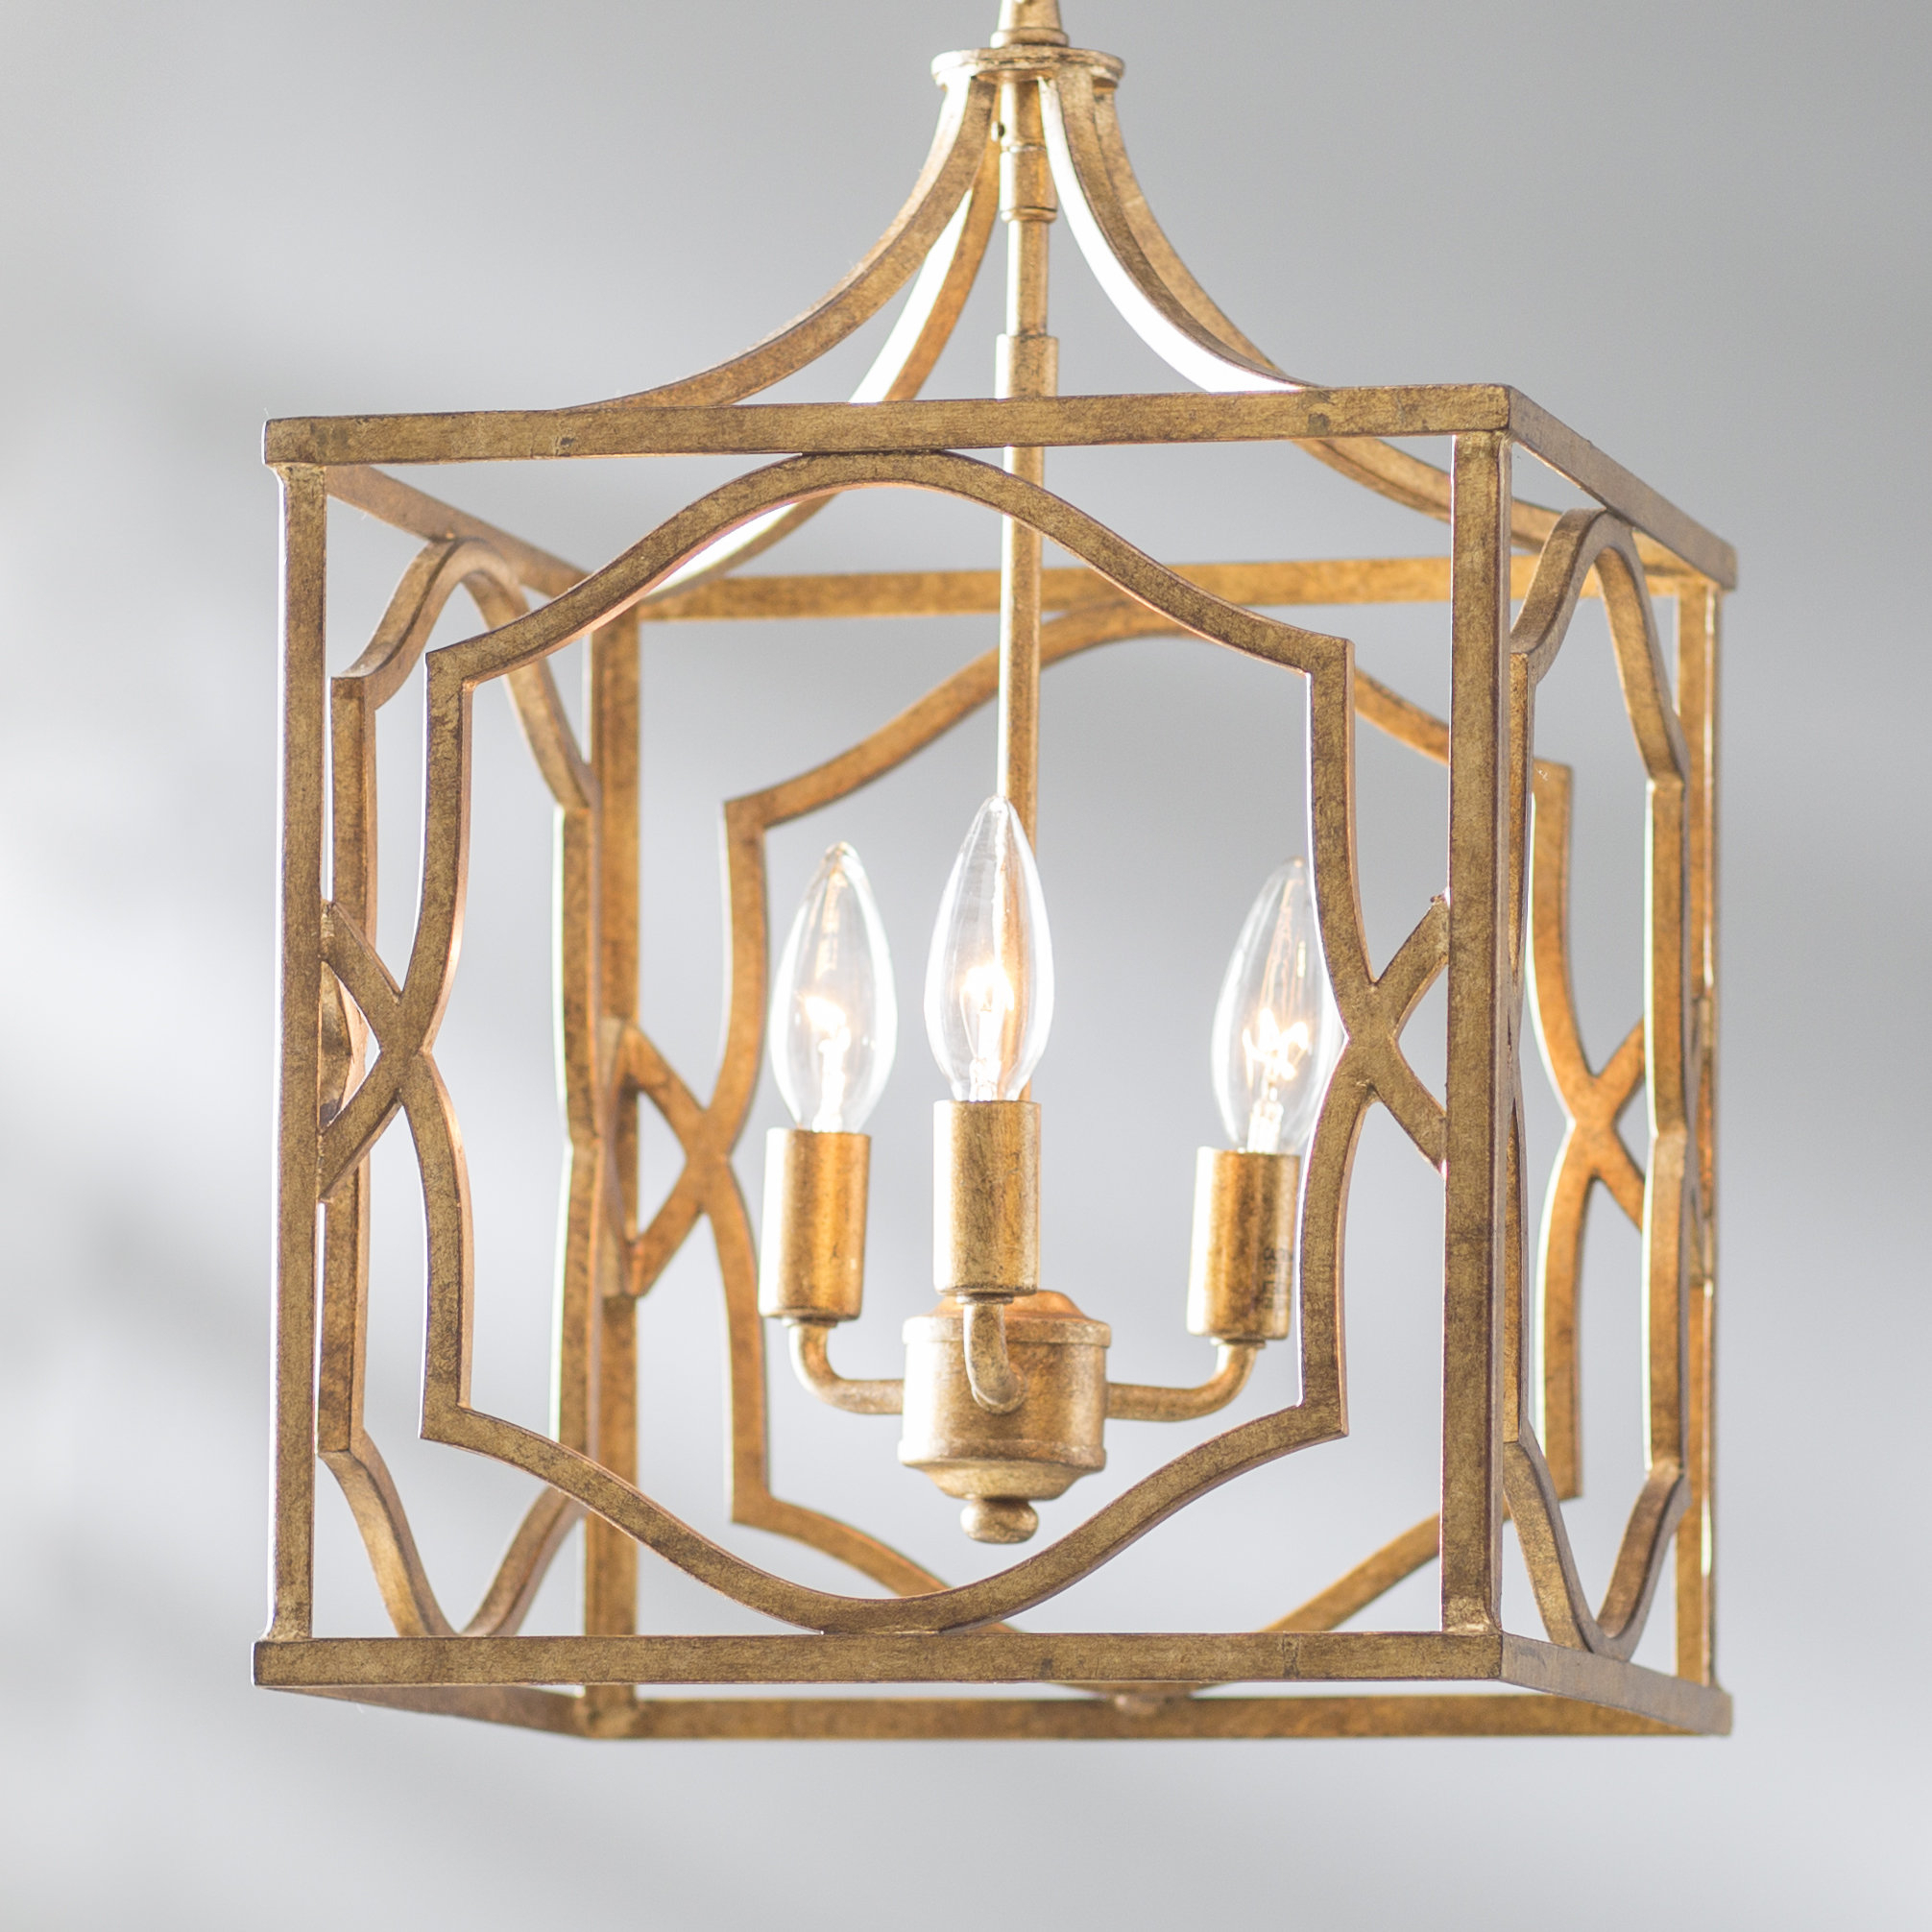 Willa Arlo Interiors Destrey 3 Light Lantern Pendant With Destrey 3 Light Lantern Square/rectangle Pendants (View 16 of 30)